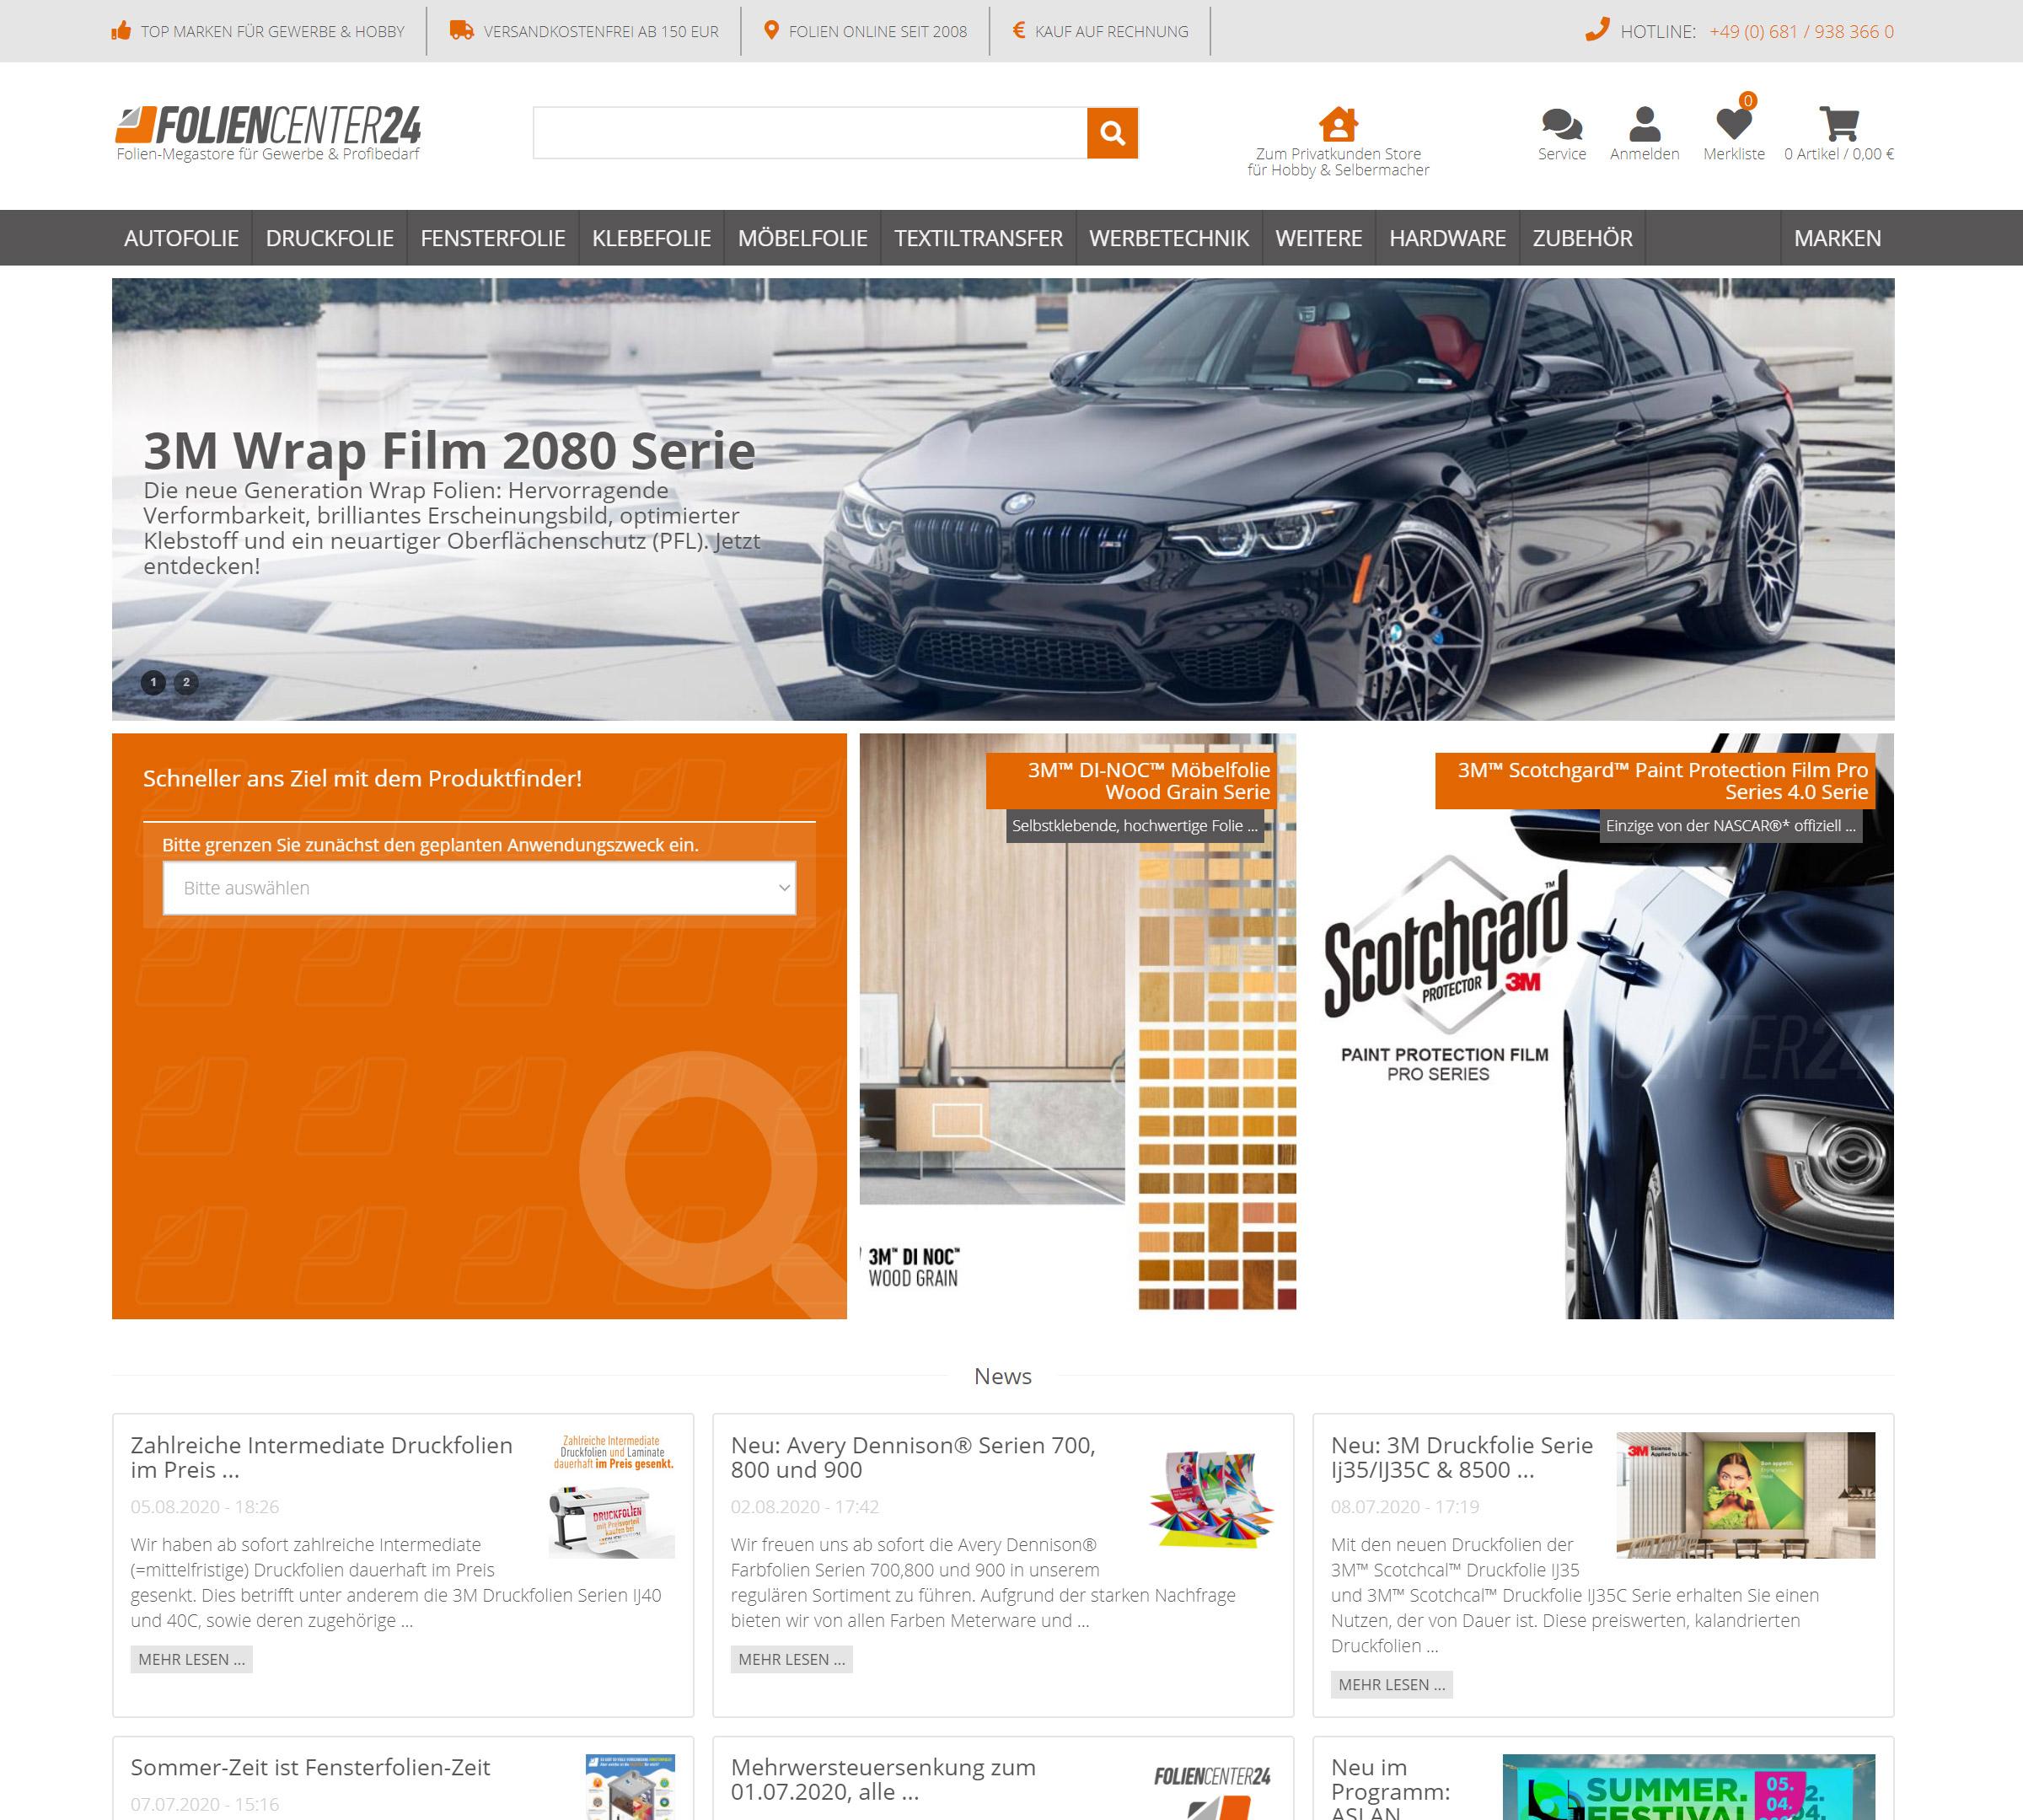 Foliencenter24 e-Commerce GmbH